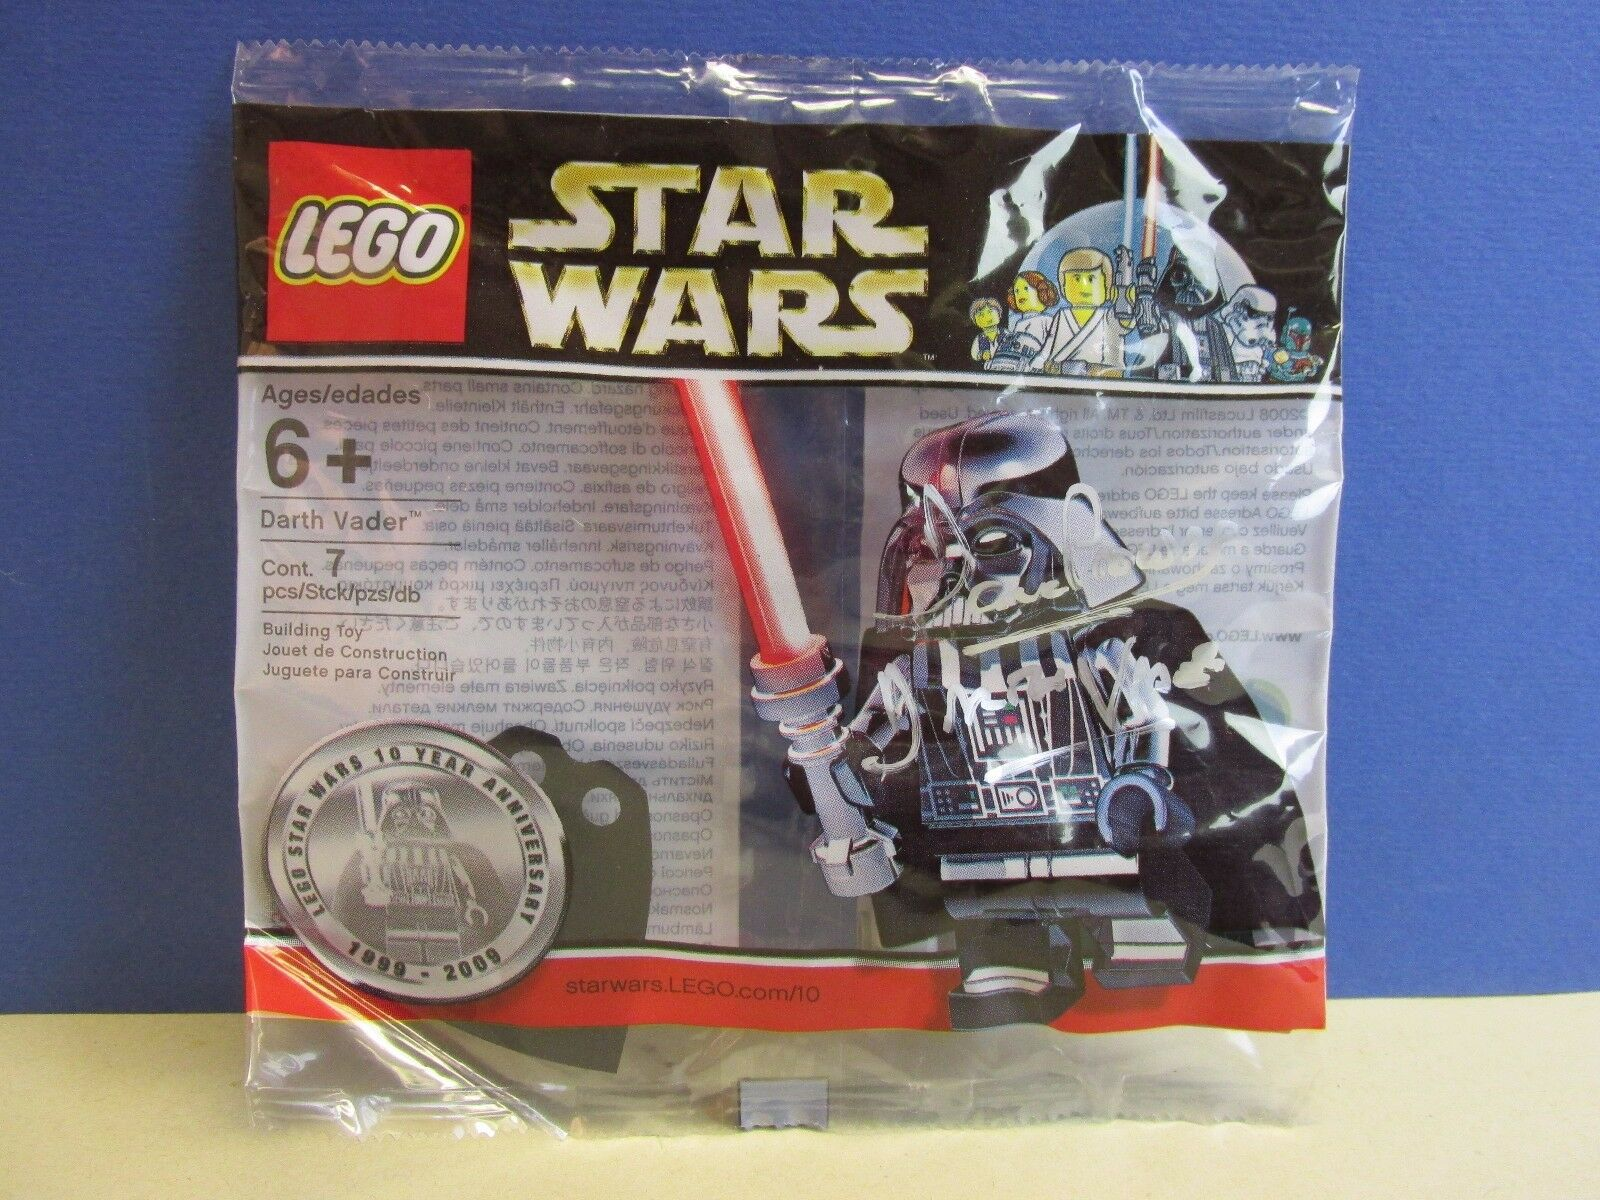 Signée par par par David Prowse LEGO Star Wars Chrome Darth Vader figurine polybag RARE 8ef048